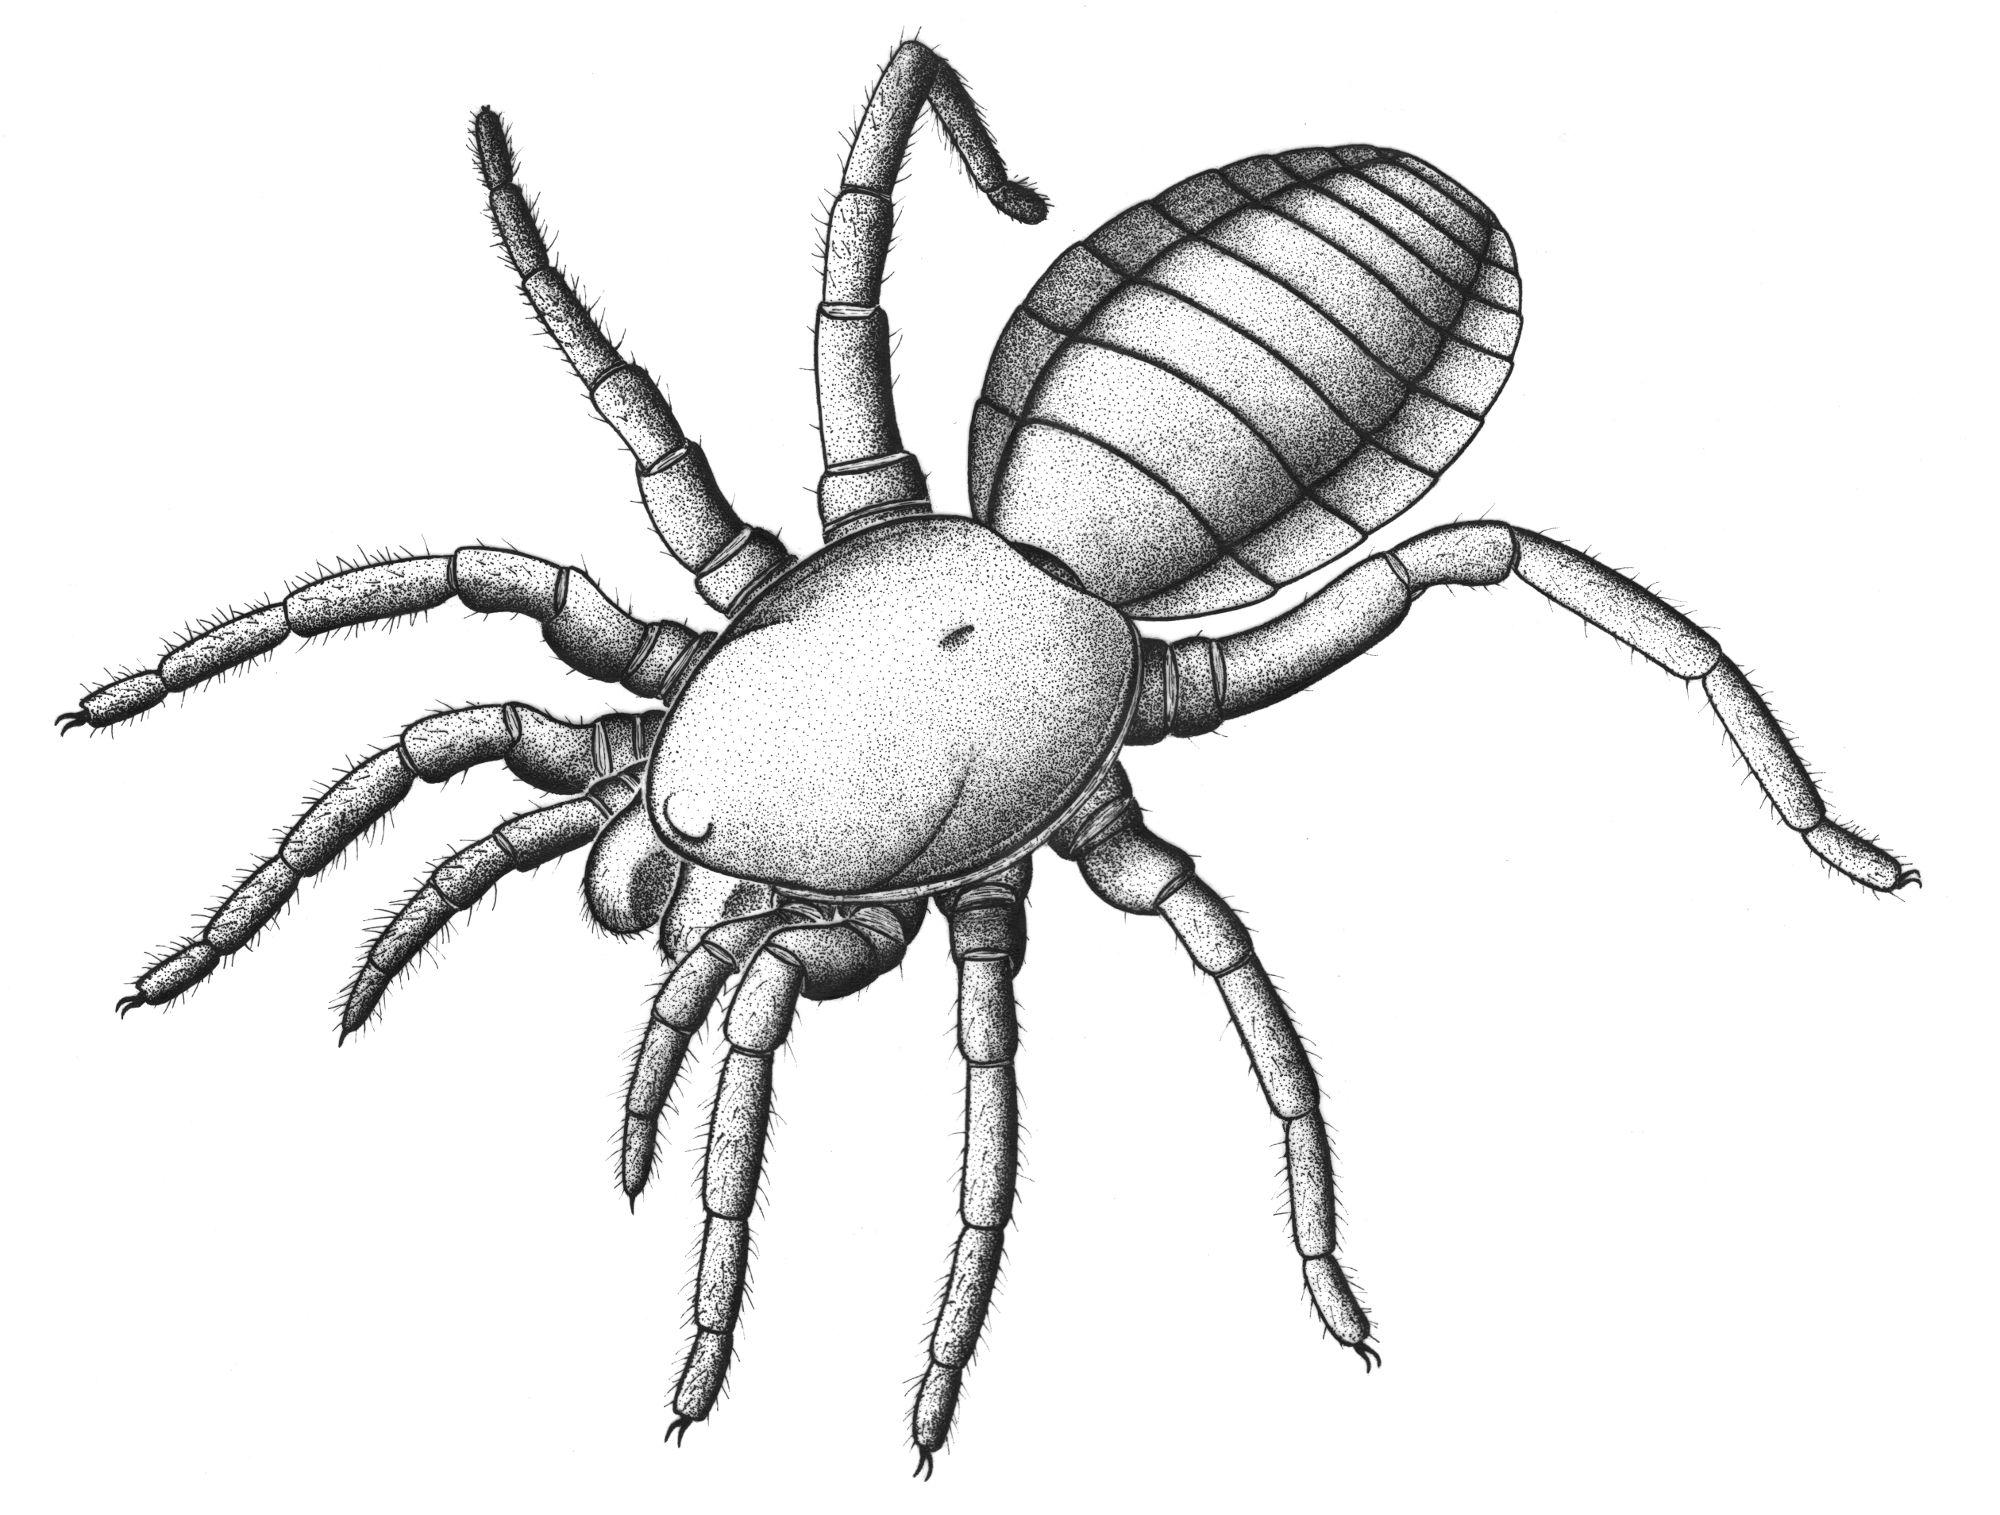 Suggested appearance of the spiderlike arachnid Idmonarachne brasieri. Illustration courtesy of Garwood RJ et al., Proc. R. Soc. B, (2016)